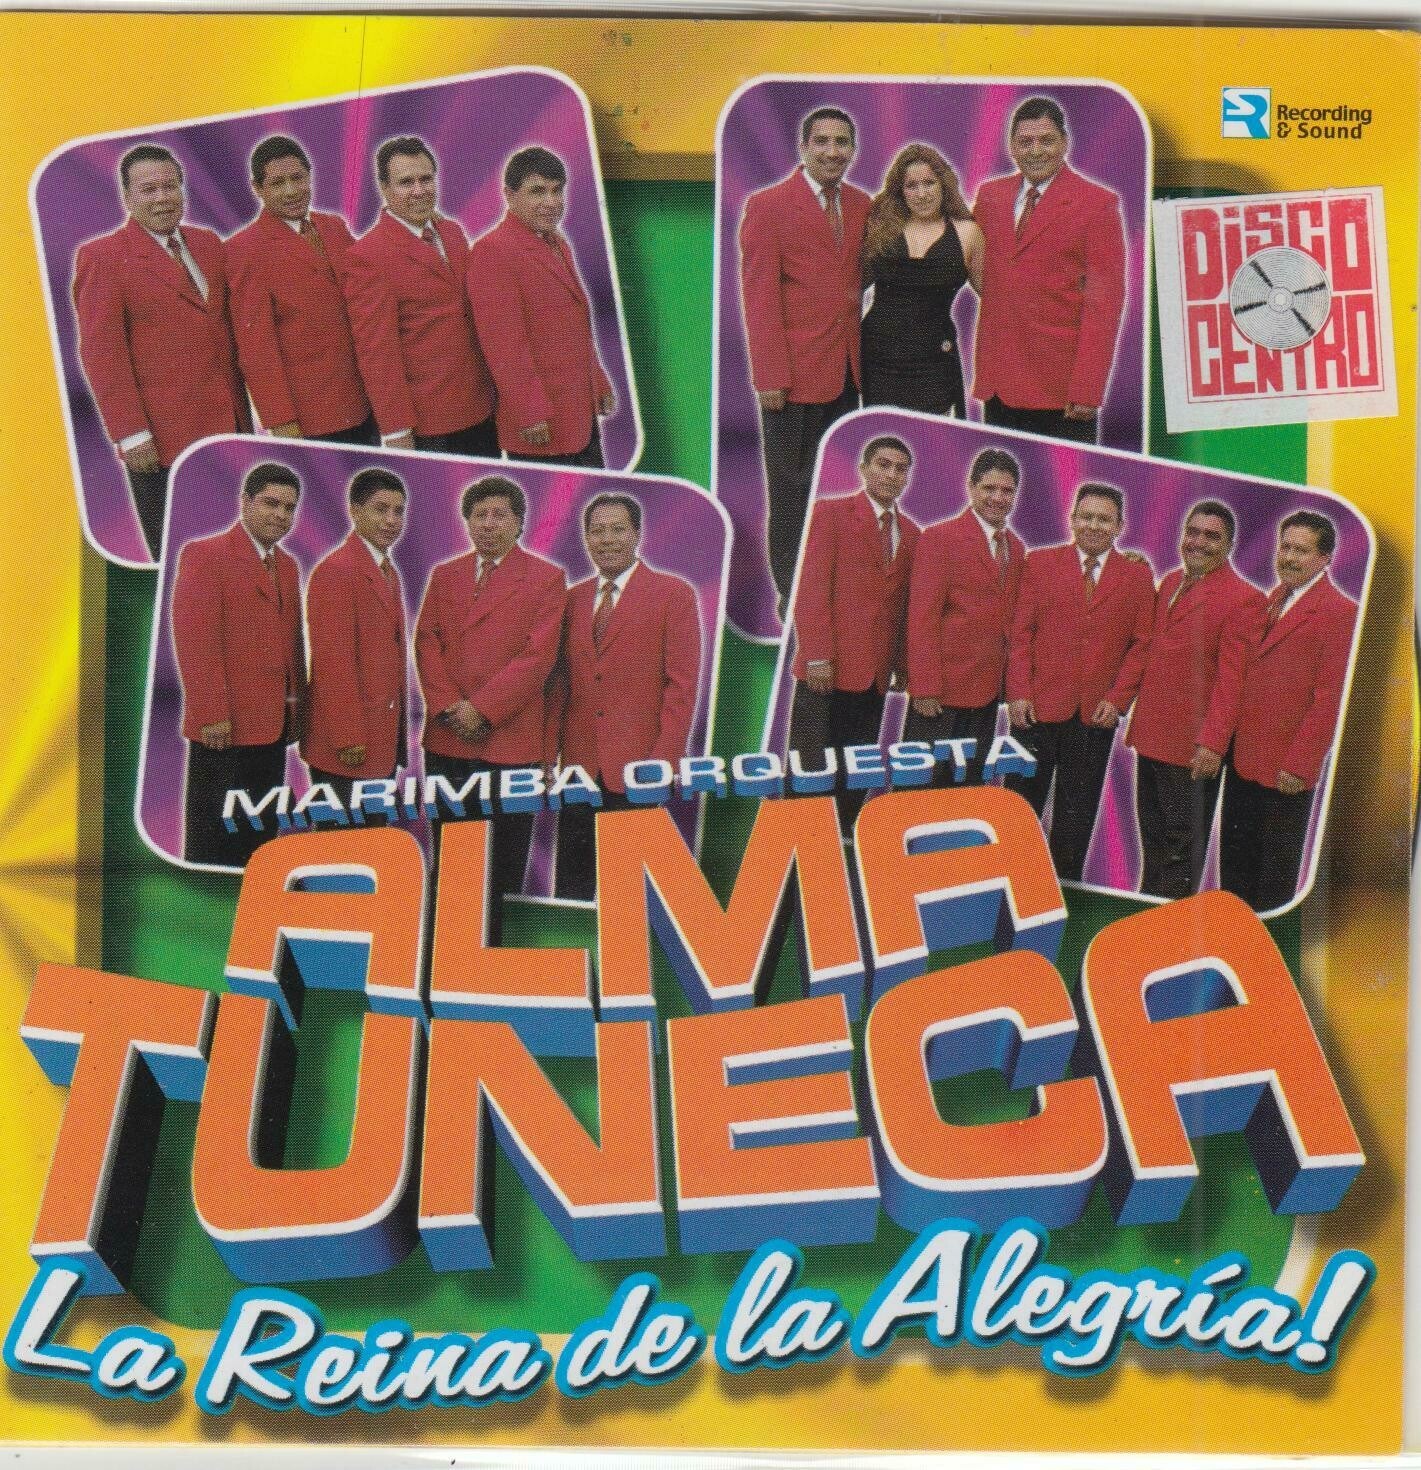 CD Marimba Orquesta Alma tuneca - La reina